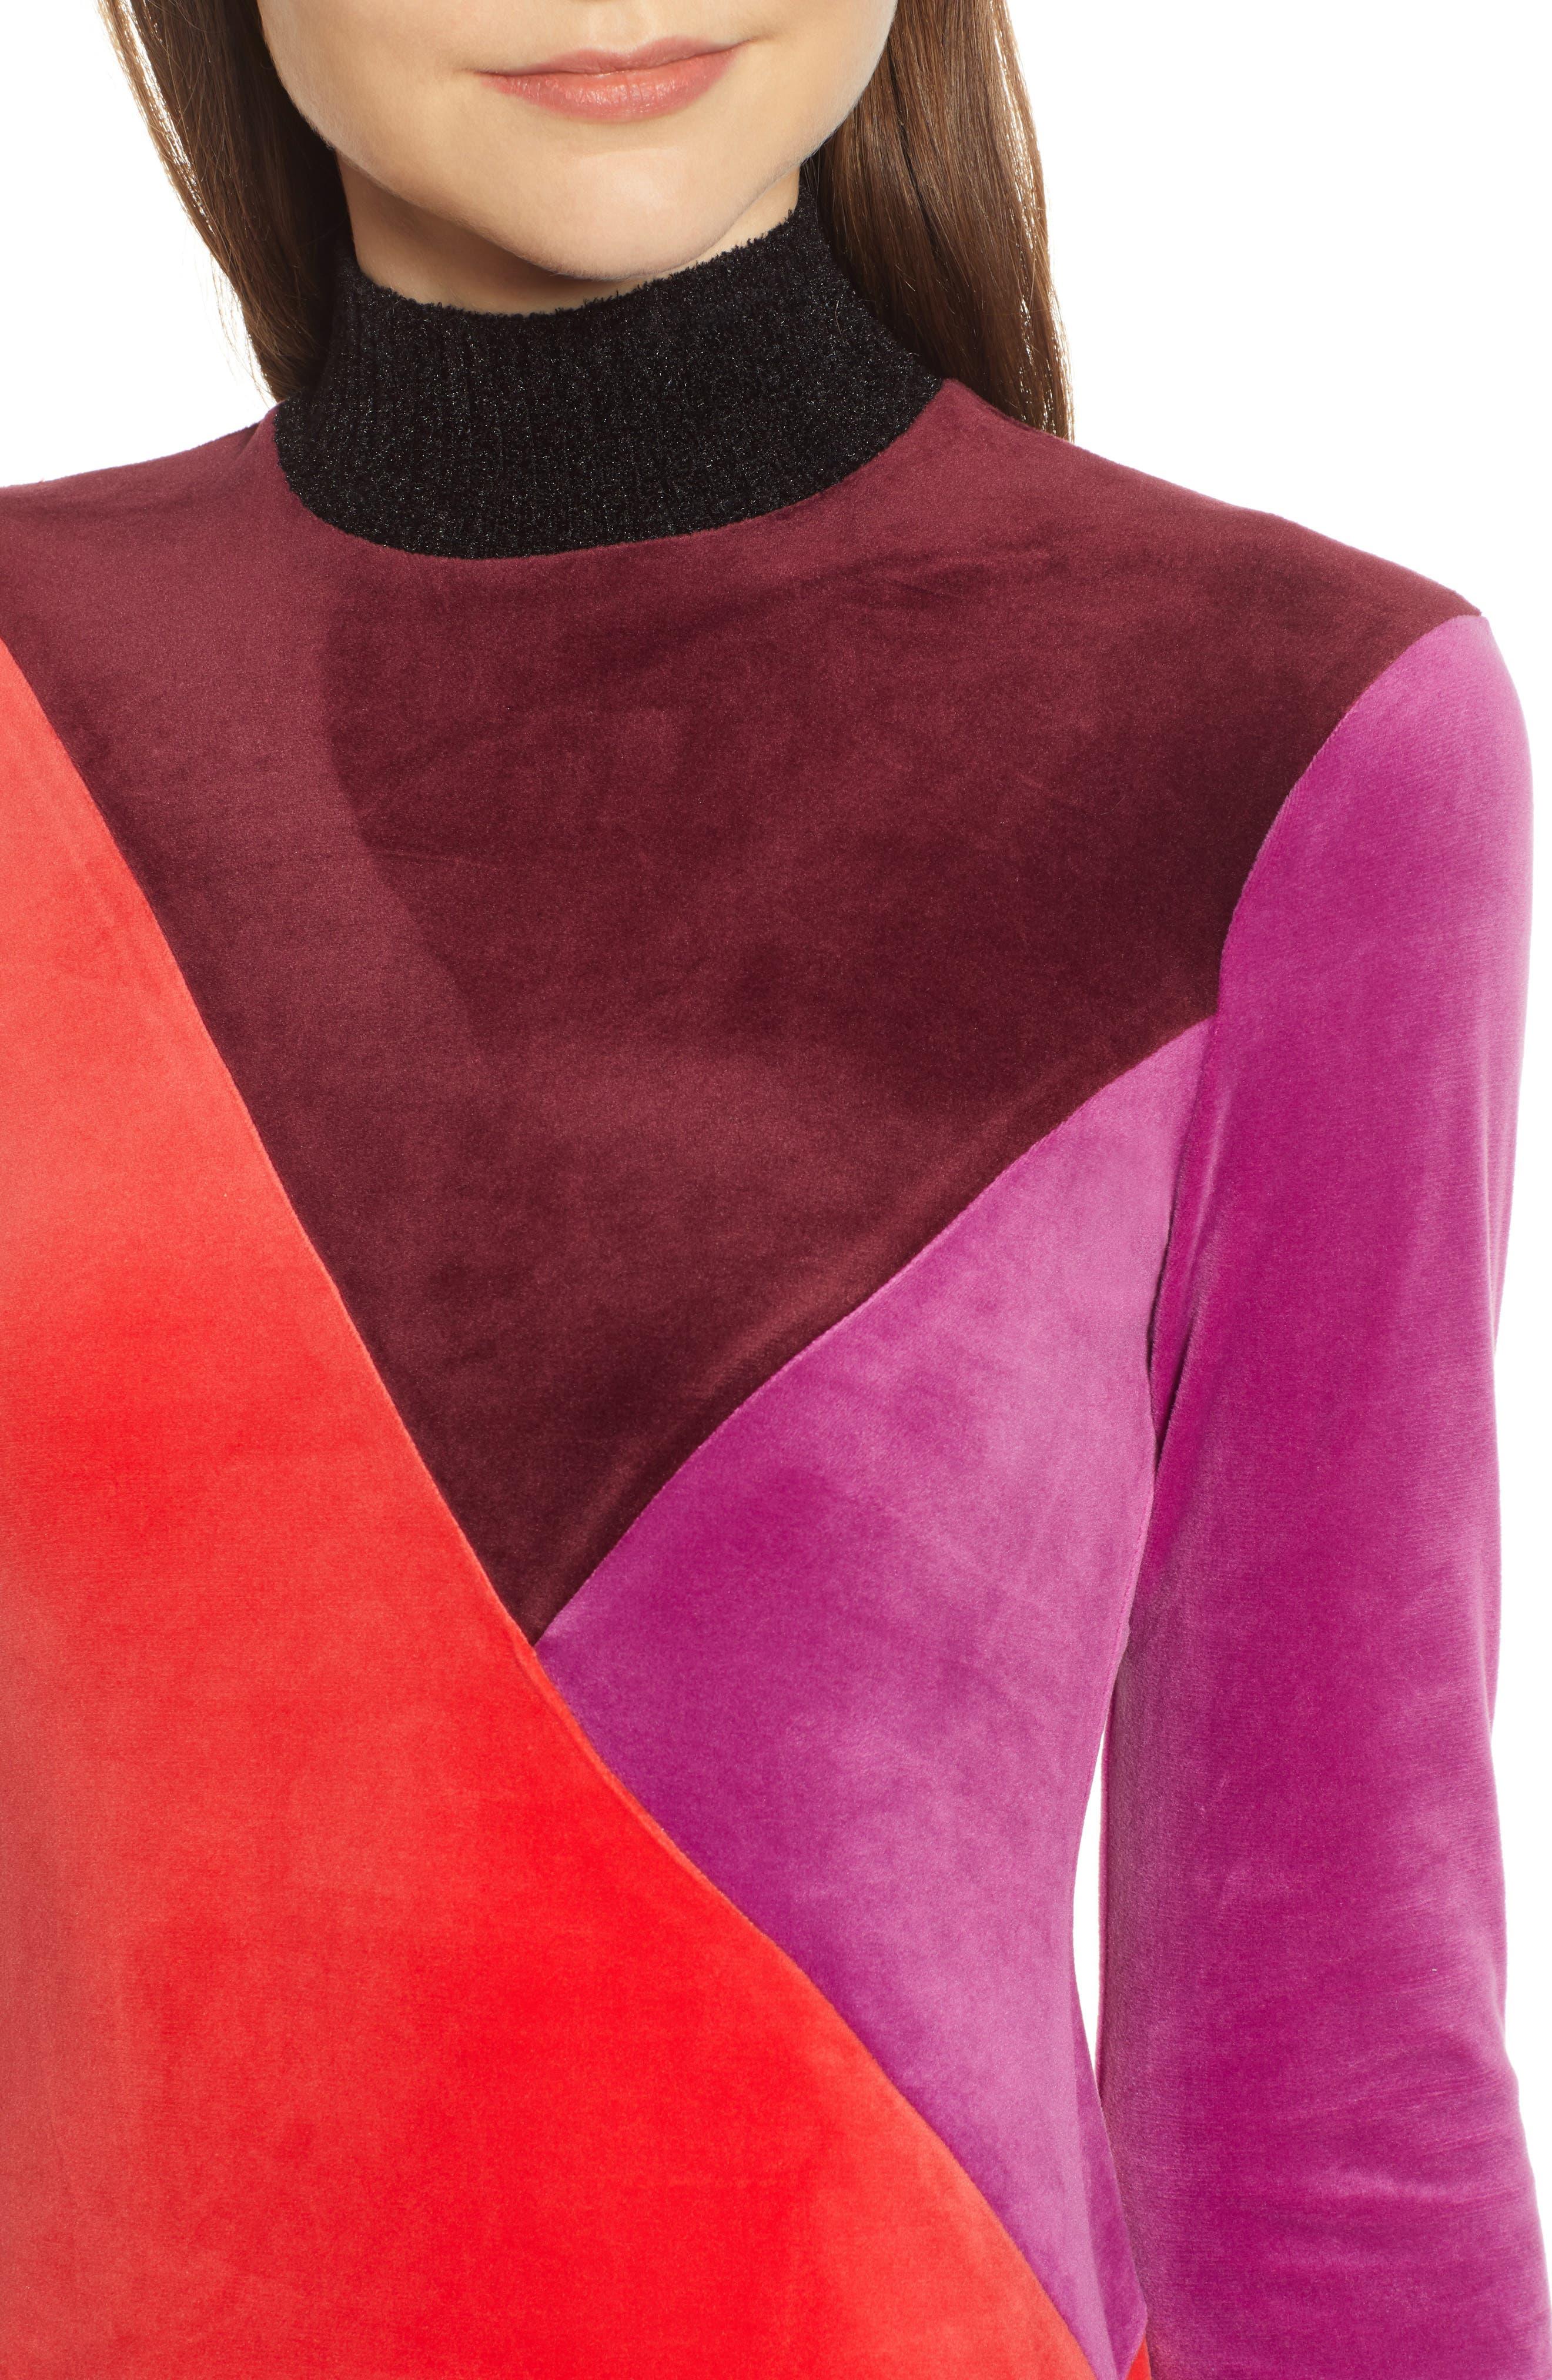 Velluto Velour Midi Dress,                             Alternate thumbnail 4, color,                             BORGOGNA